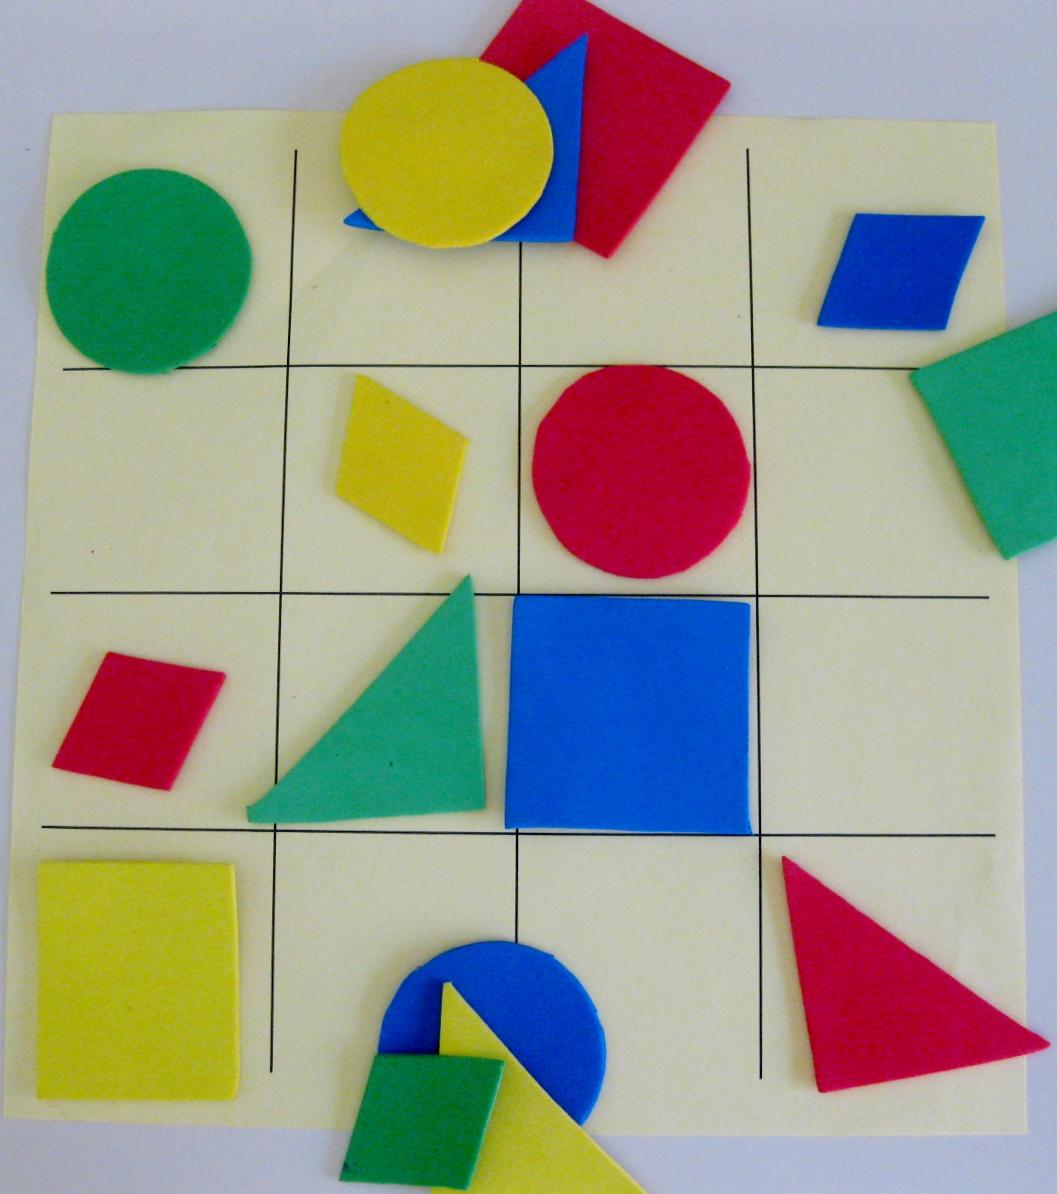 image from Latin & Euler squares